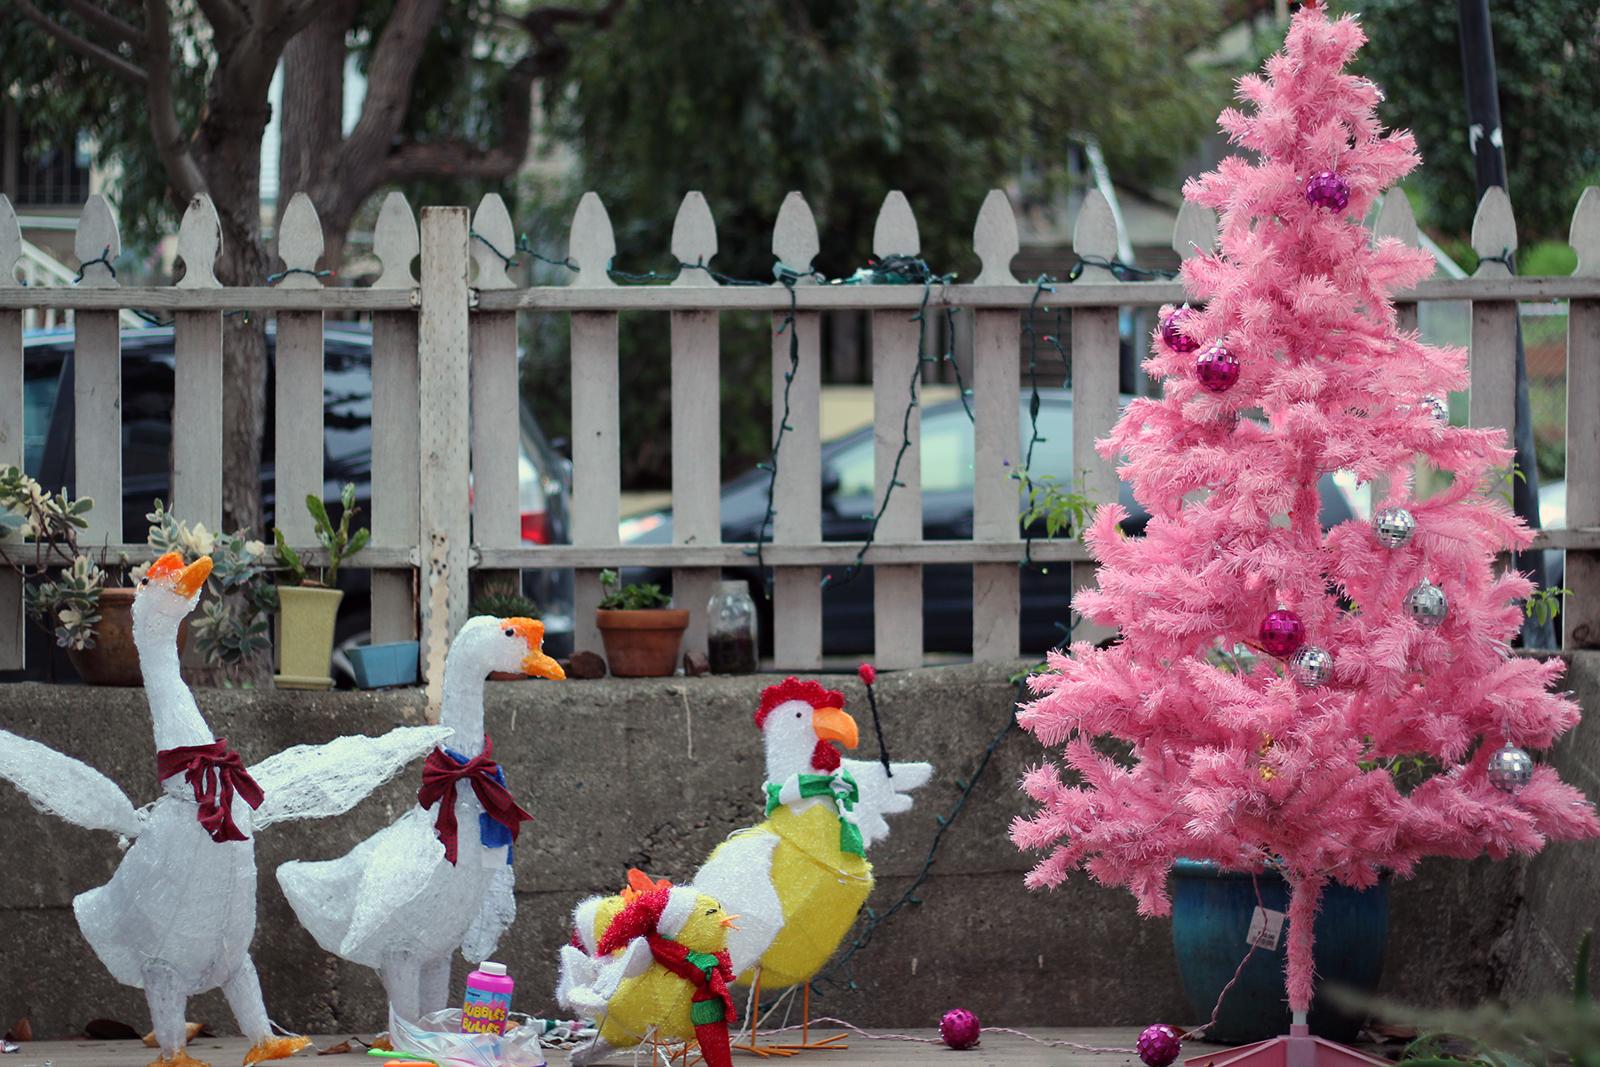 Holiday Decorations. Photo by Jamie Goldberg